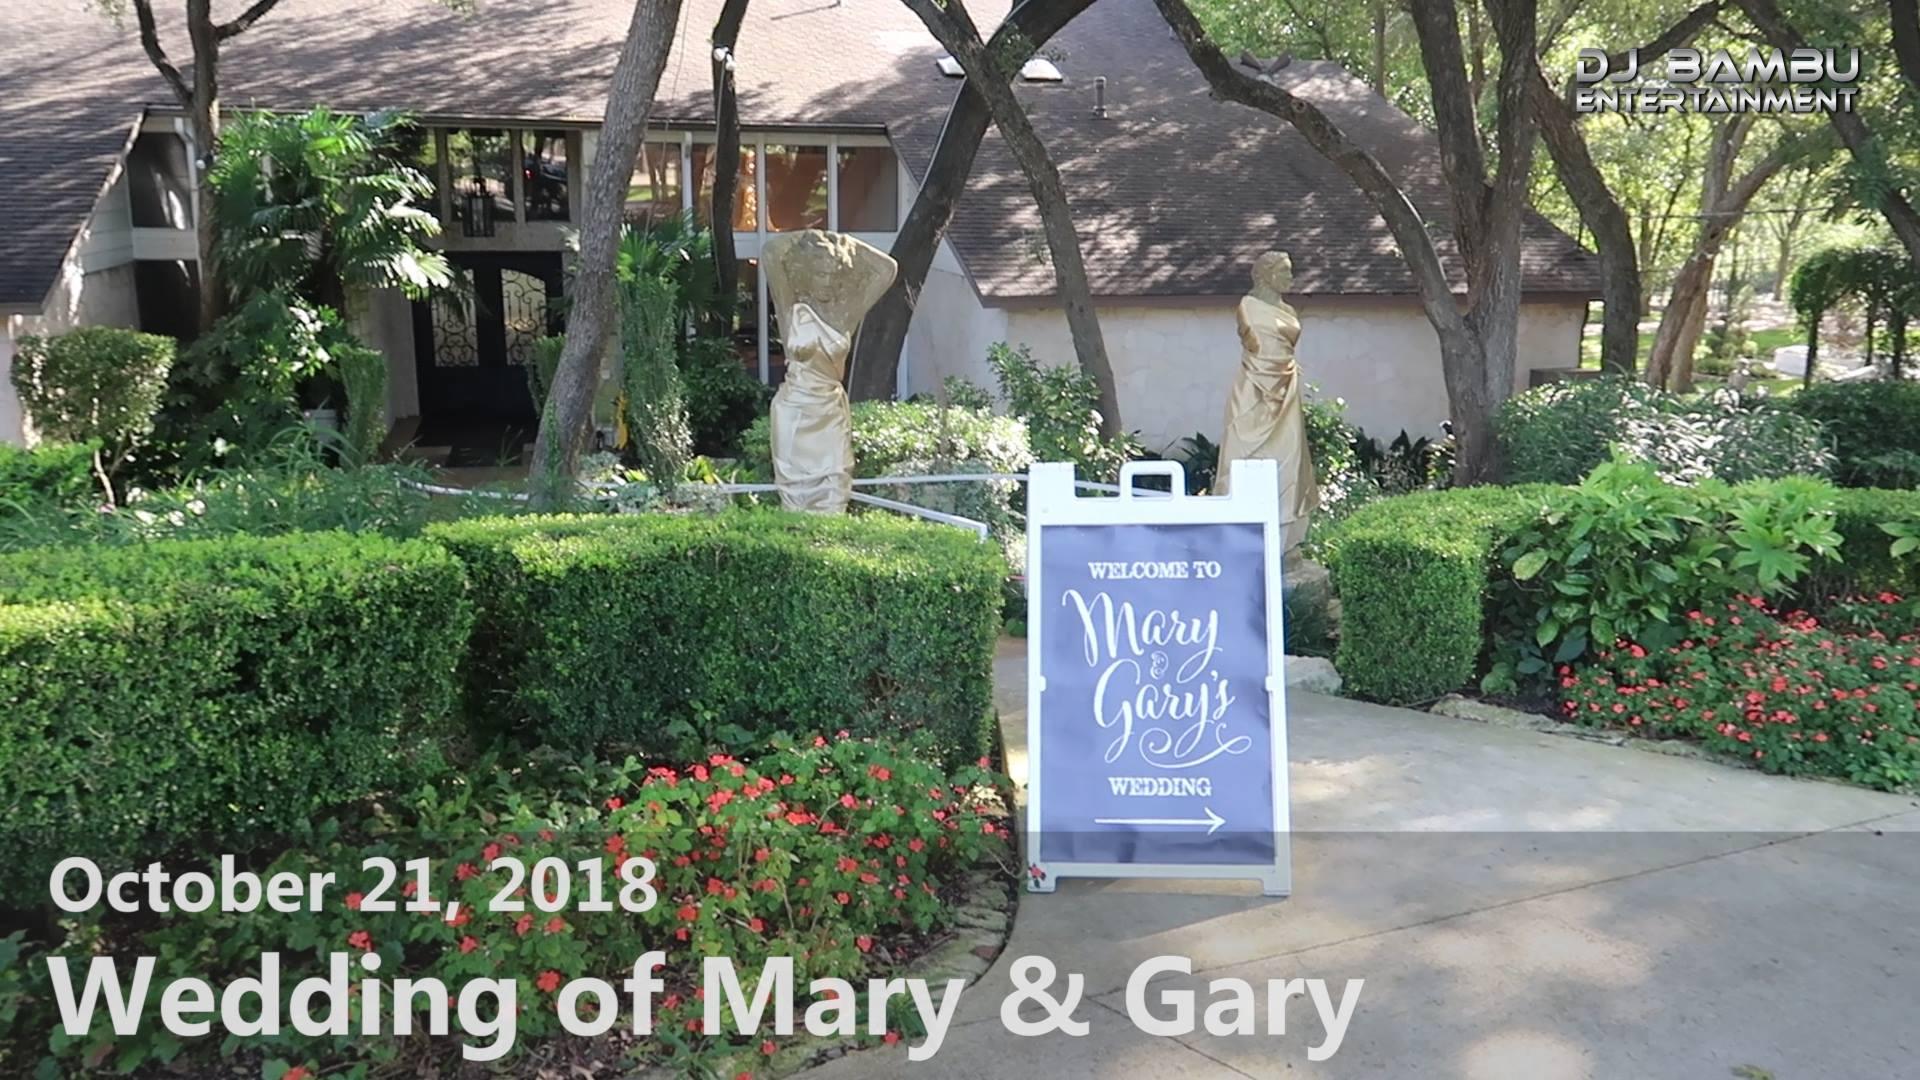 Mary & Gary's Wedding (10/21/18)